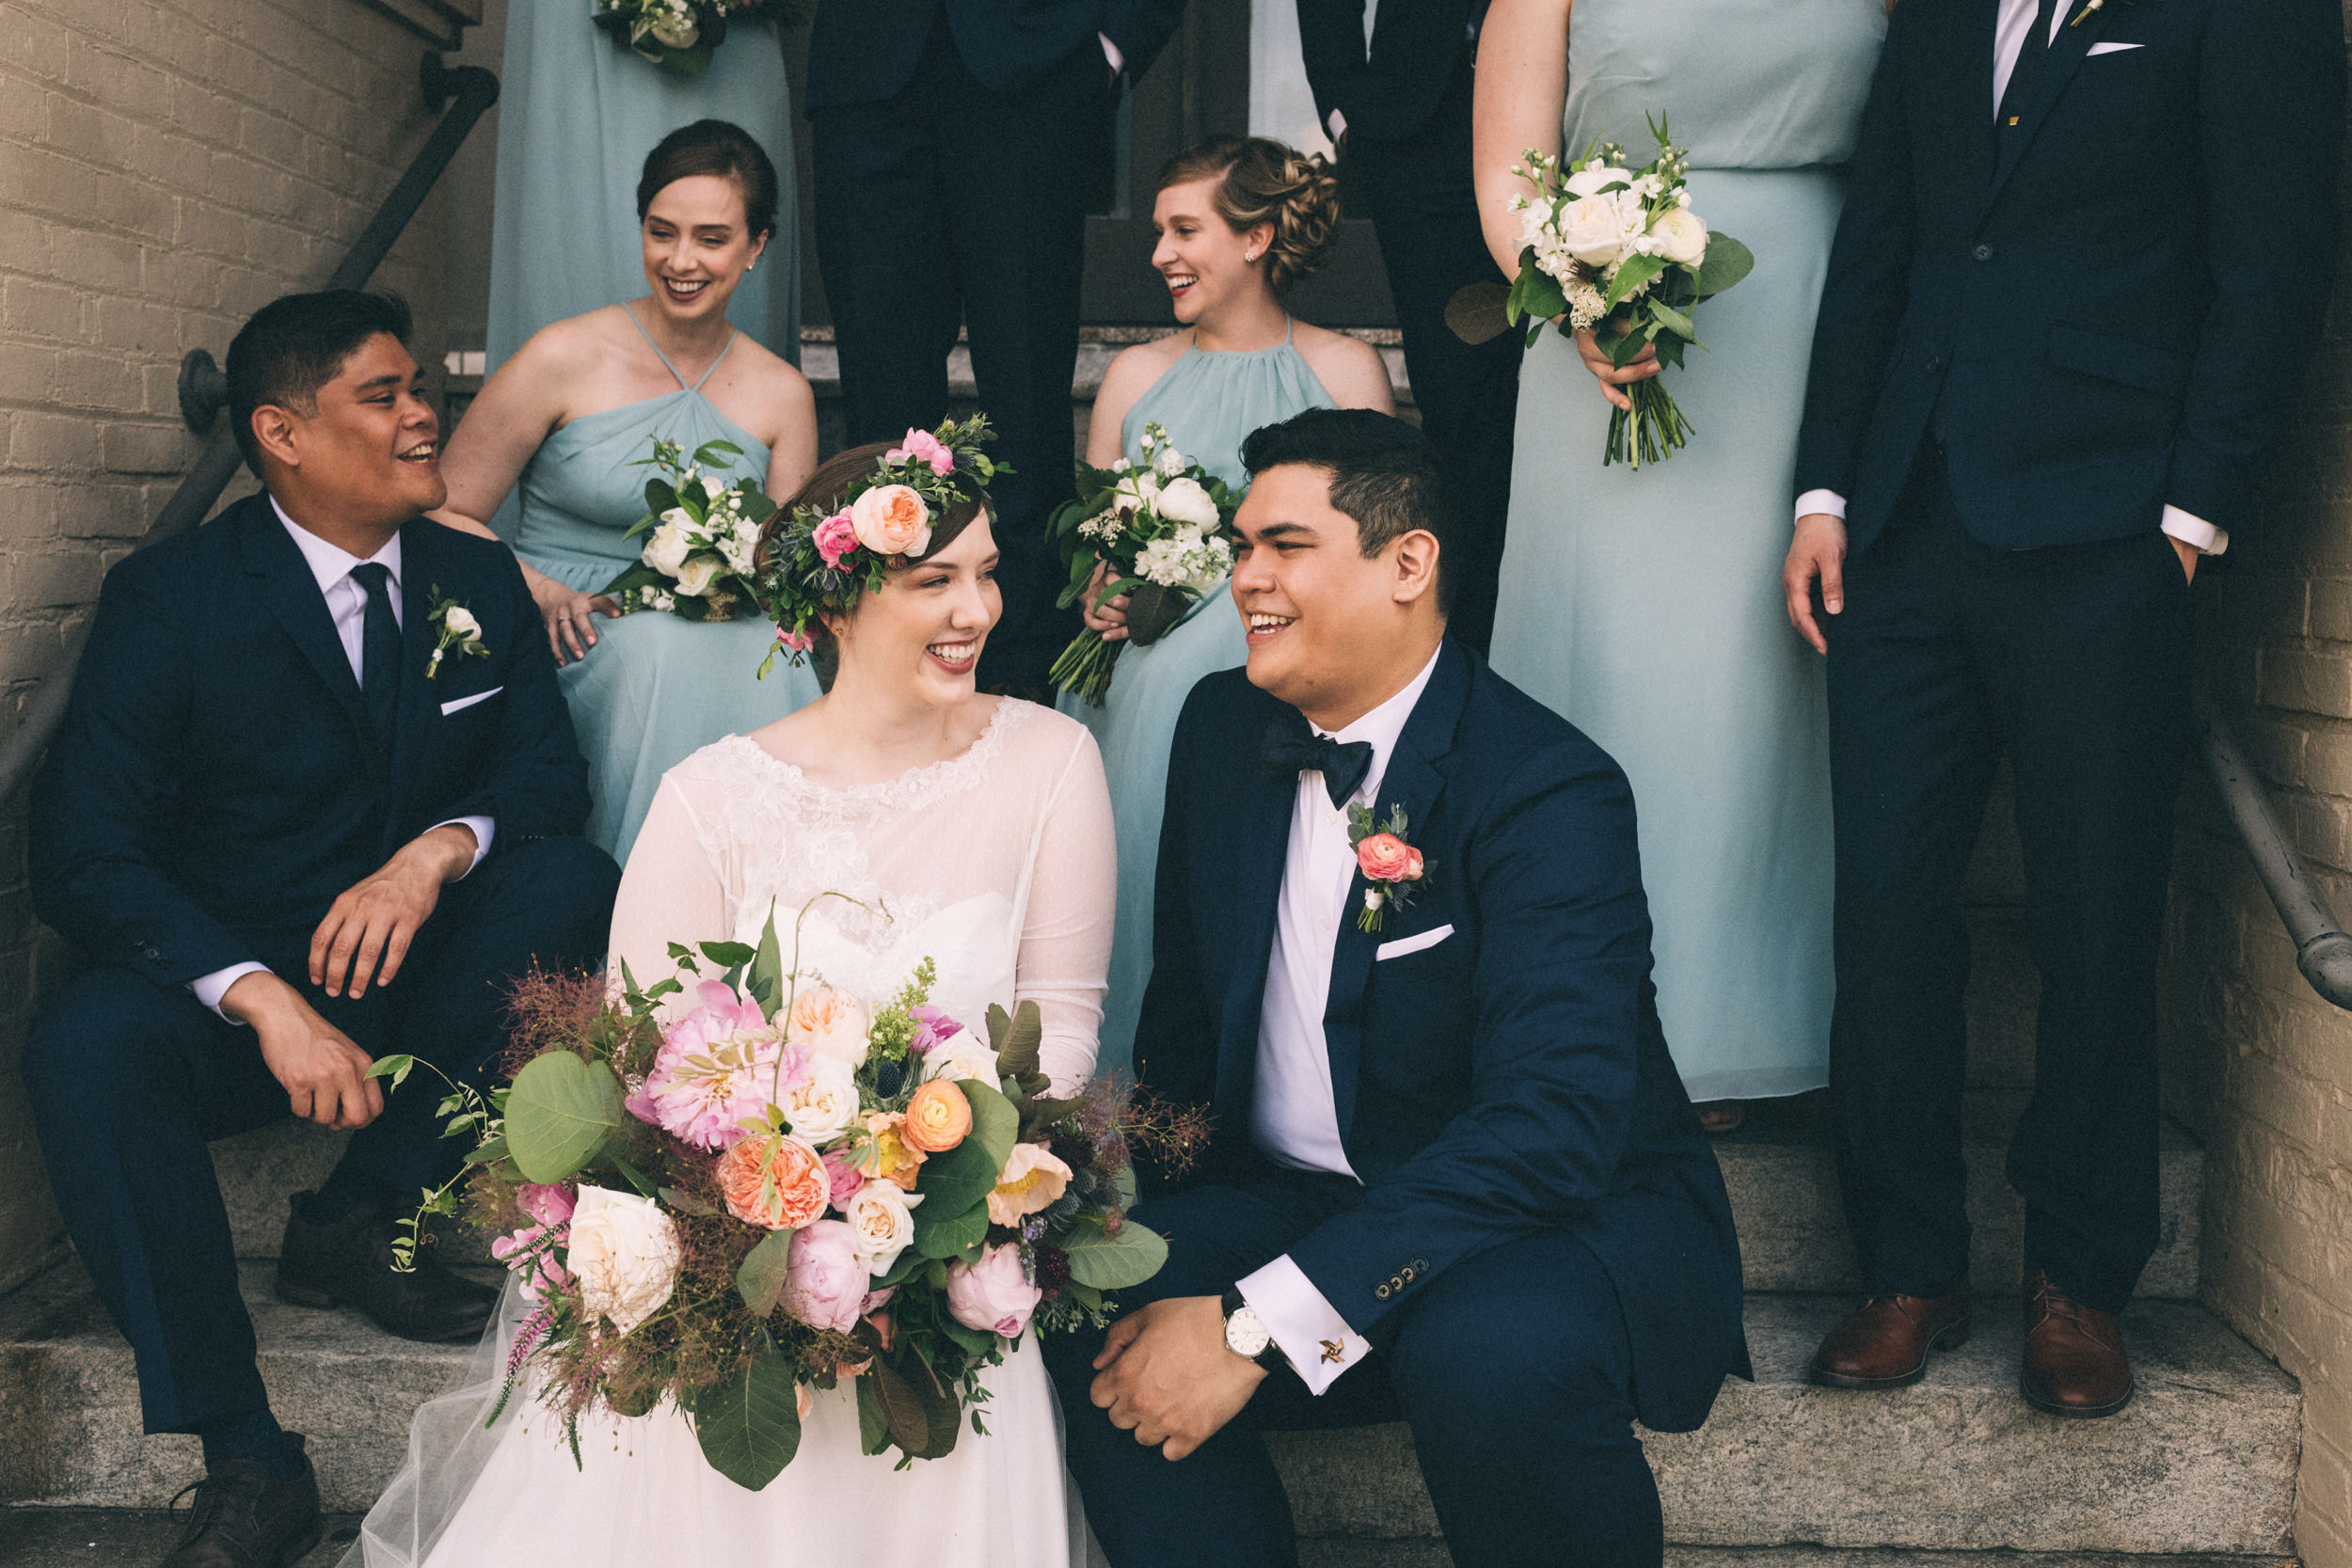 lauren-dean-wedding-grand-lodge-kentucky-sarah-katherine-davis-photography-187edit.jpg